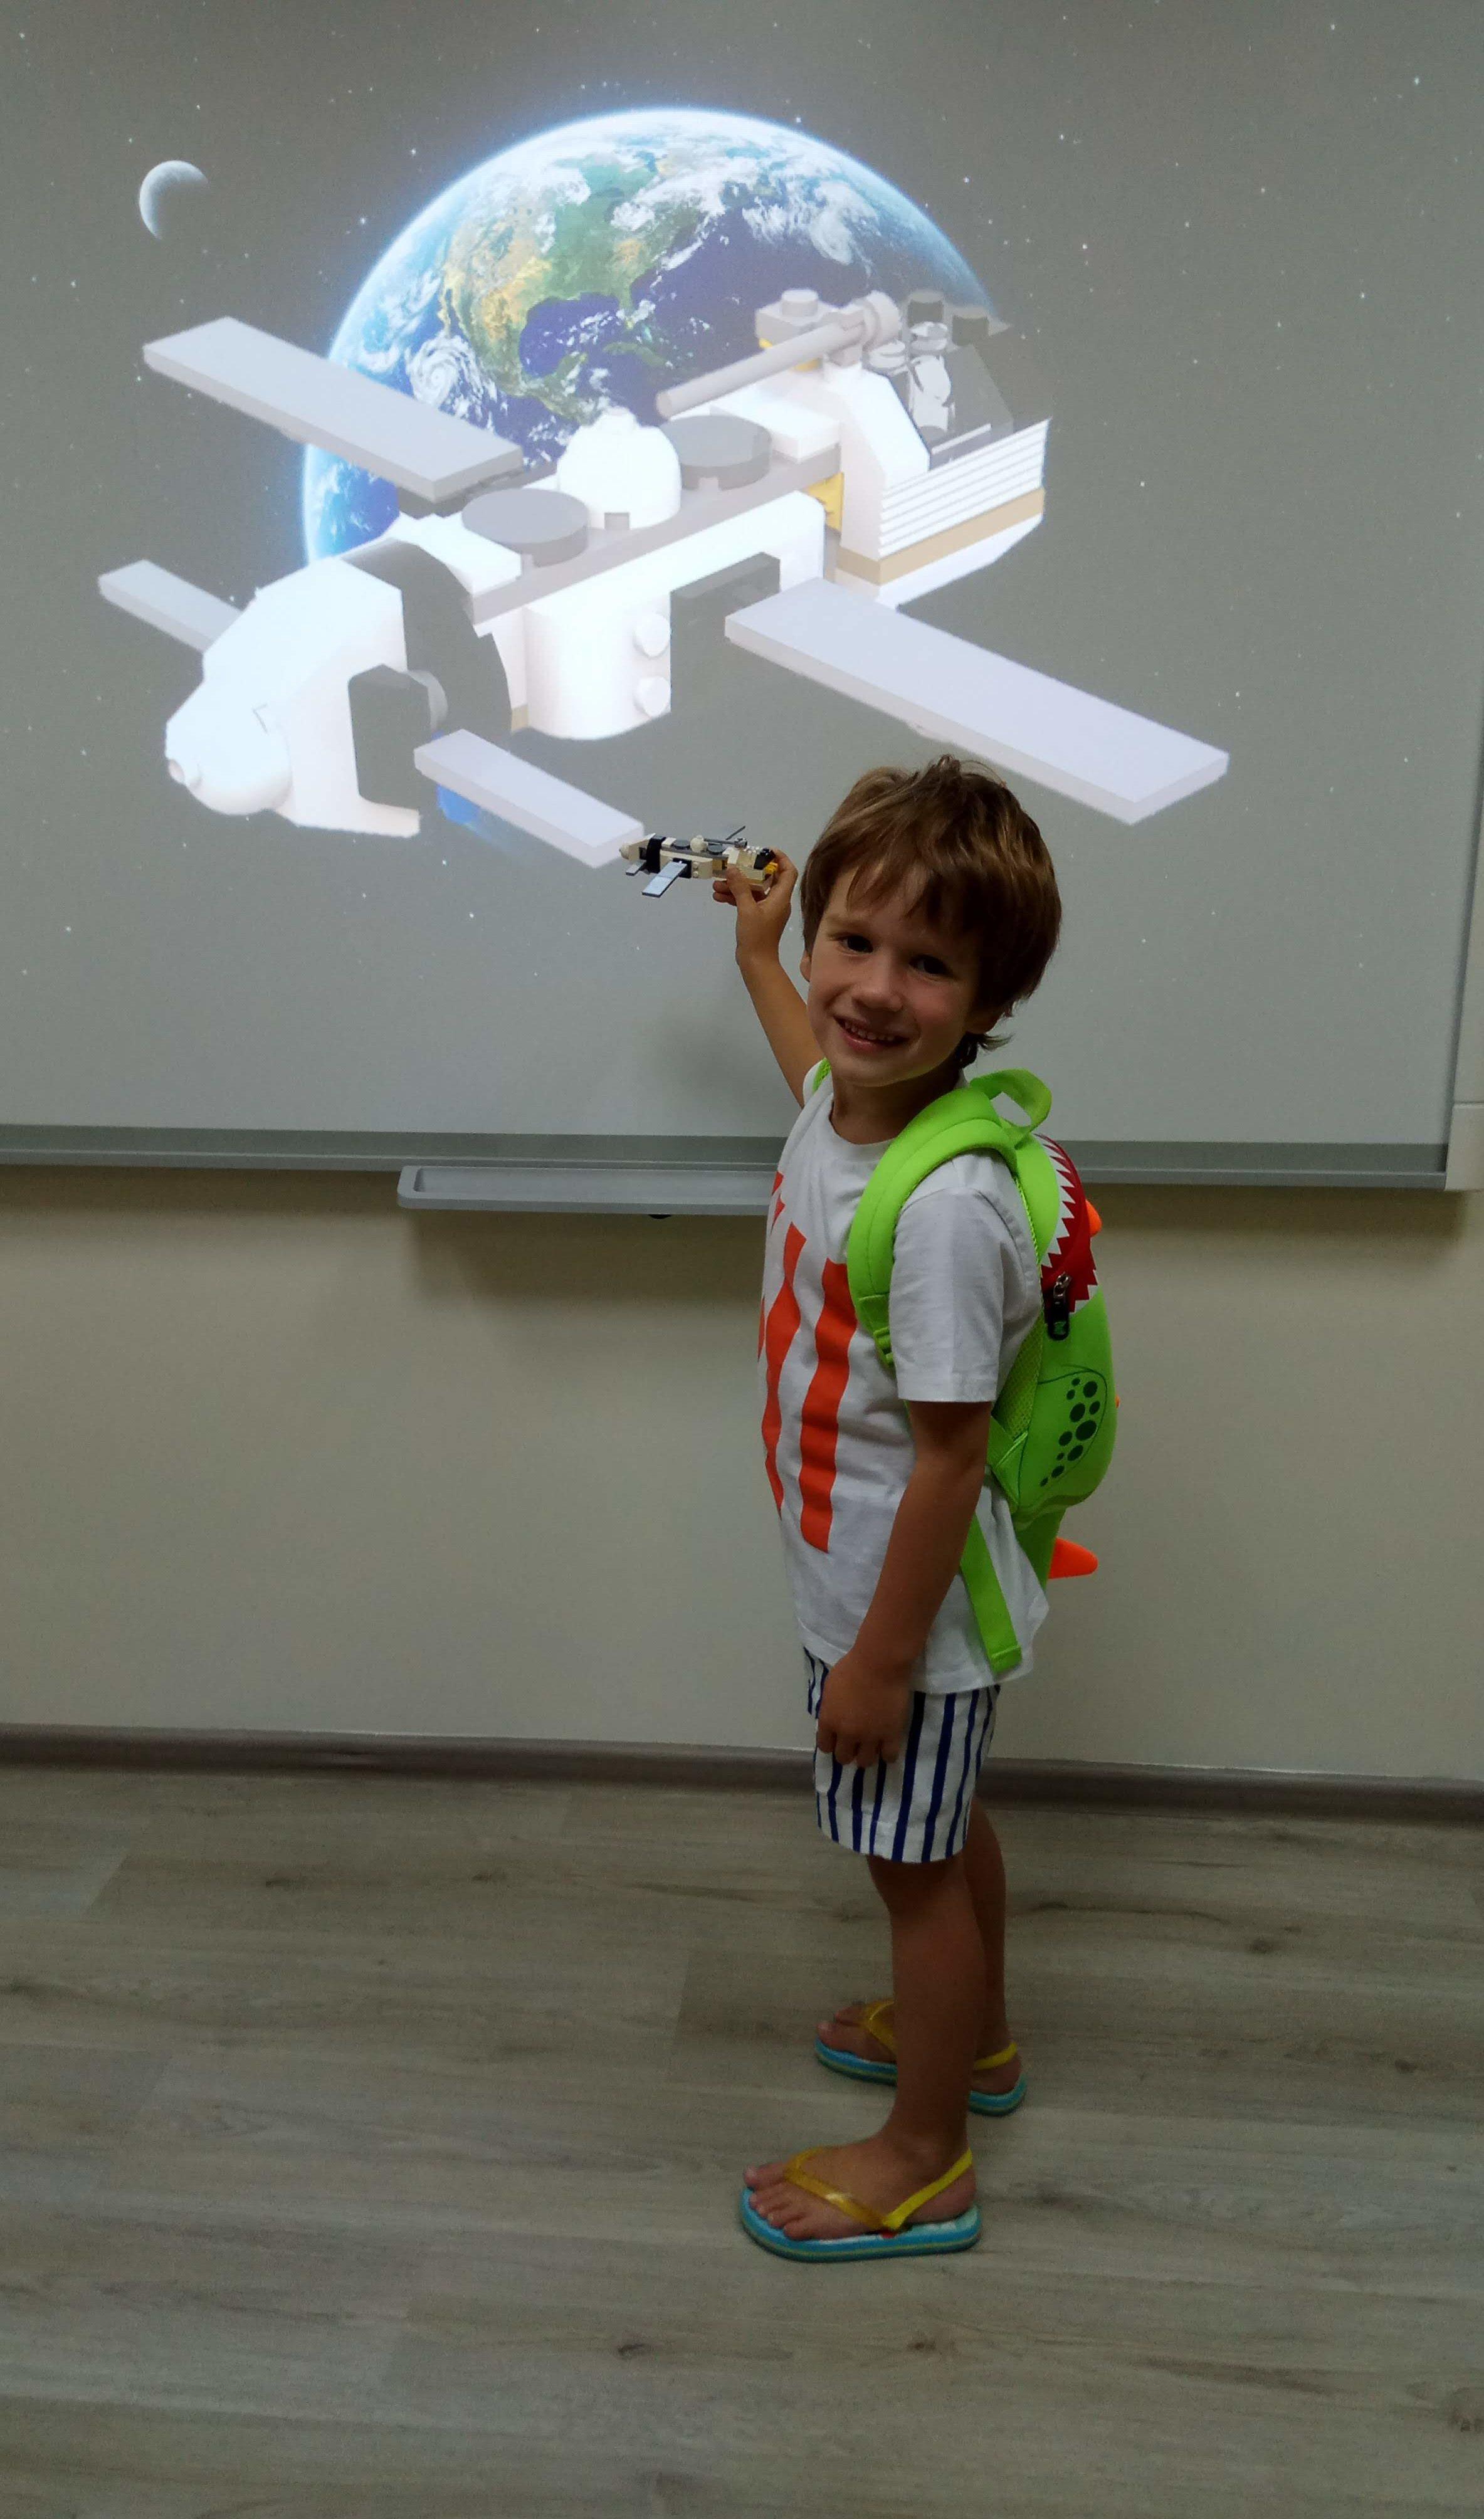 https://akademia-detstva.od.ua/app/uploads/2019/07/IMG_20190726_162040-e1564417724253.jpg